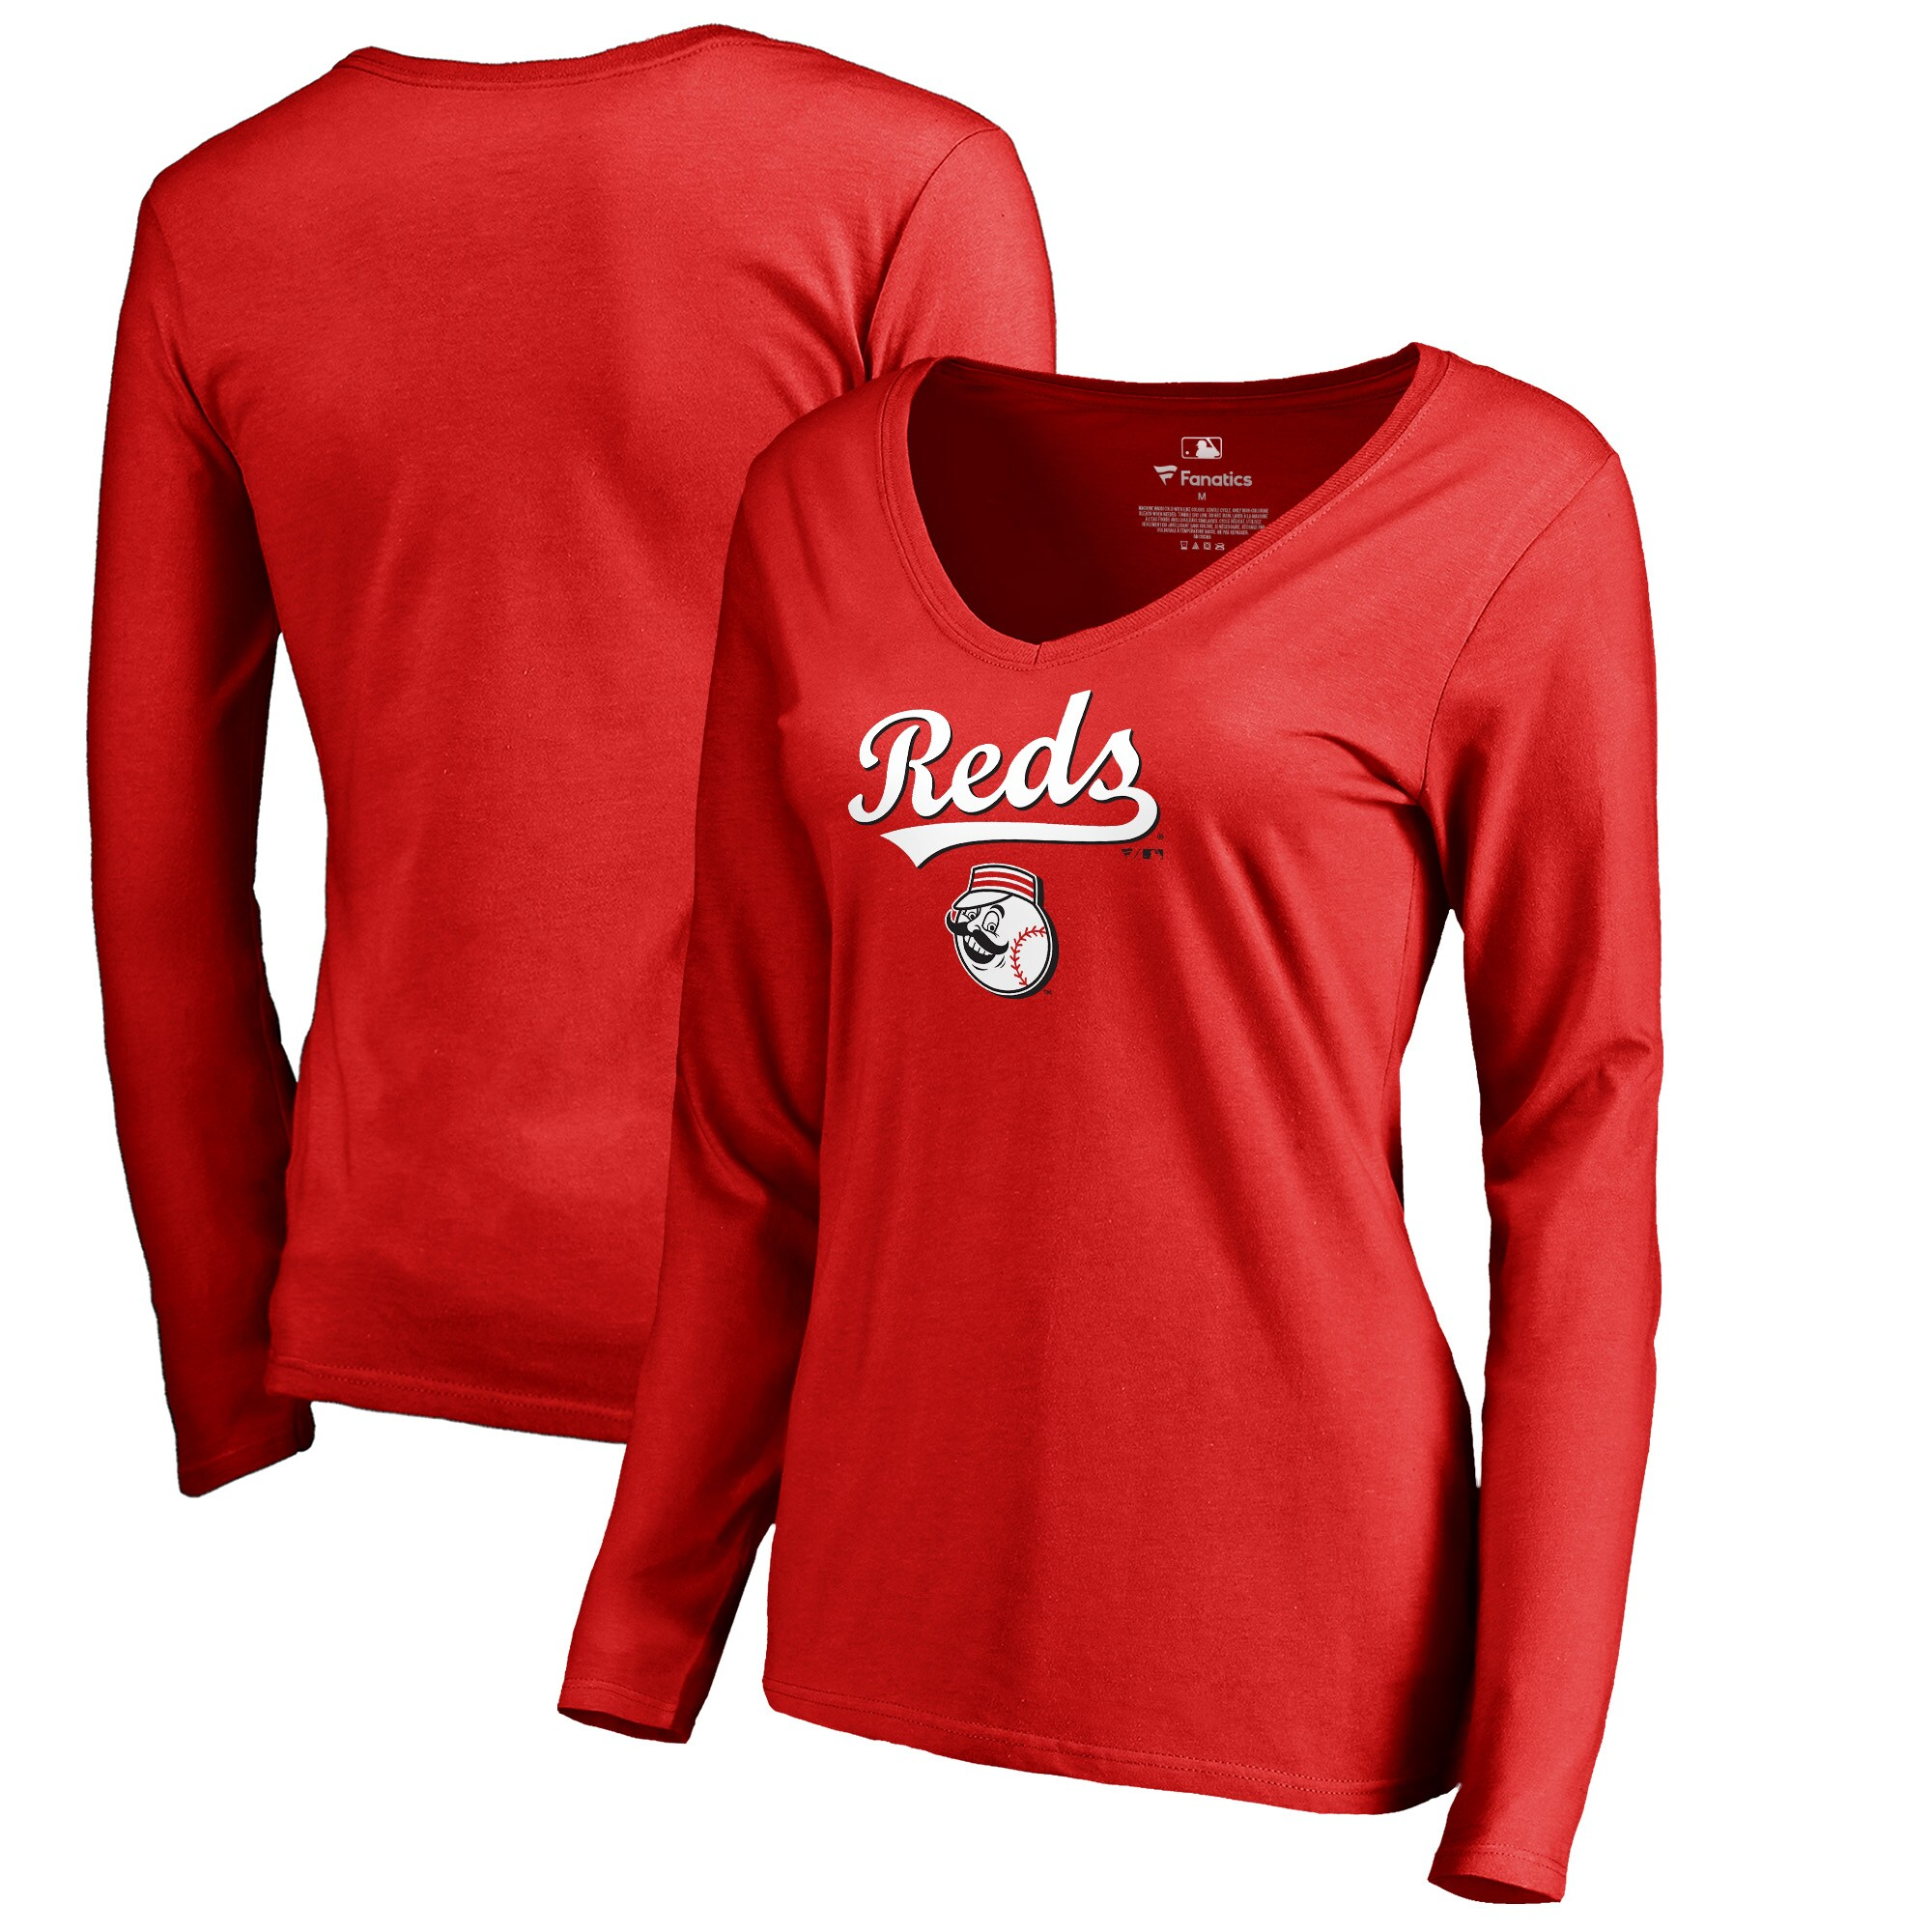 Cincinnati Reds Fanatics Branded Women's Team Lockup Slim Fit Long Sleeve V-Neck T-Shirt - Red